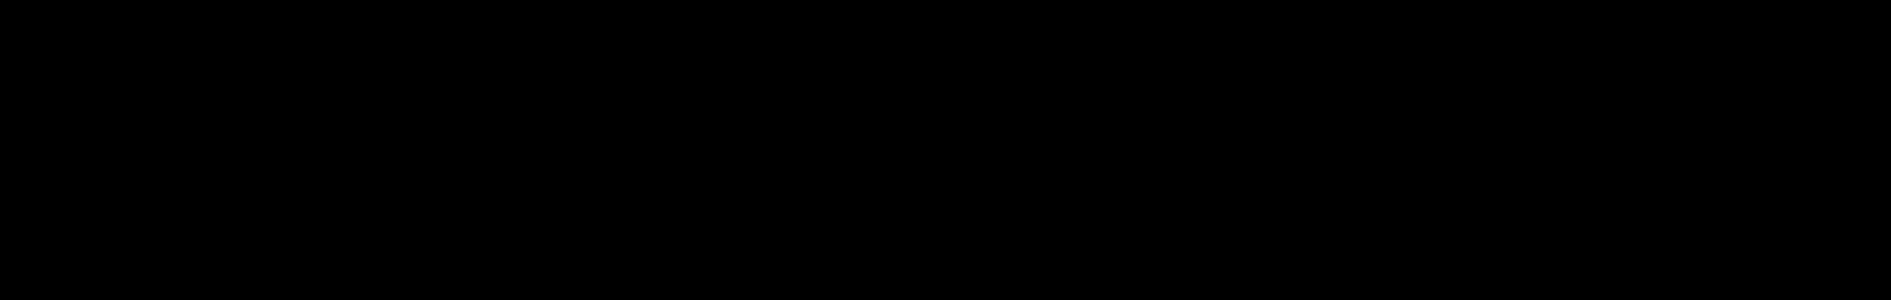 dauntless_logo_dark.png